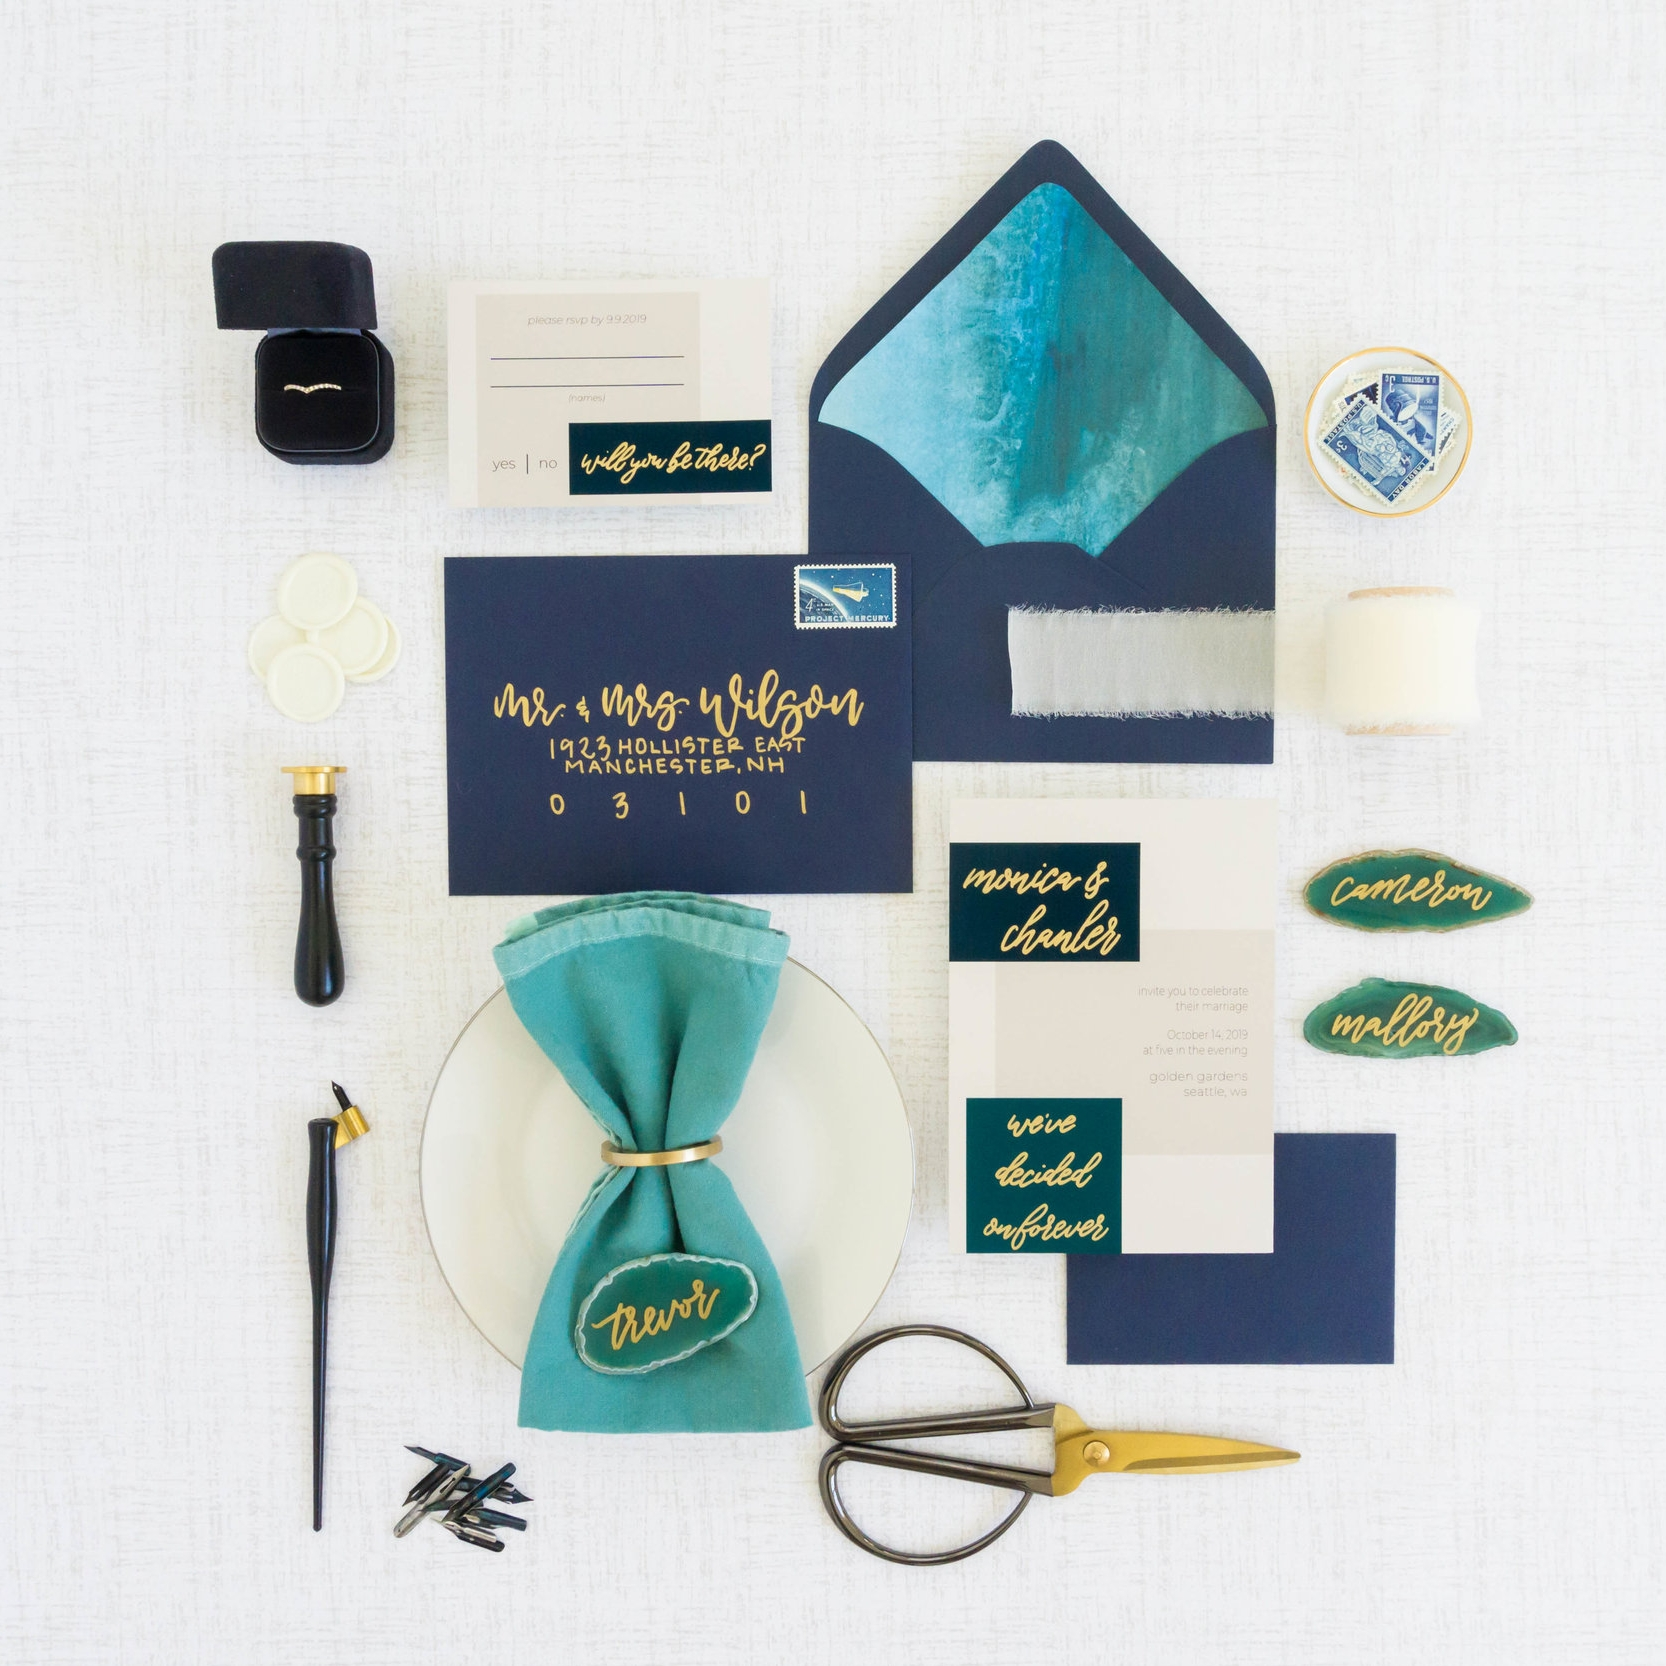 love-fern-design-studio-custom-wedding-invitations-for-the-modern-couple-modern-calligraphy-in-seattle-washington-custom-wedding-stationery15.jpg